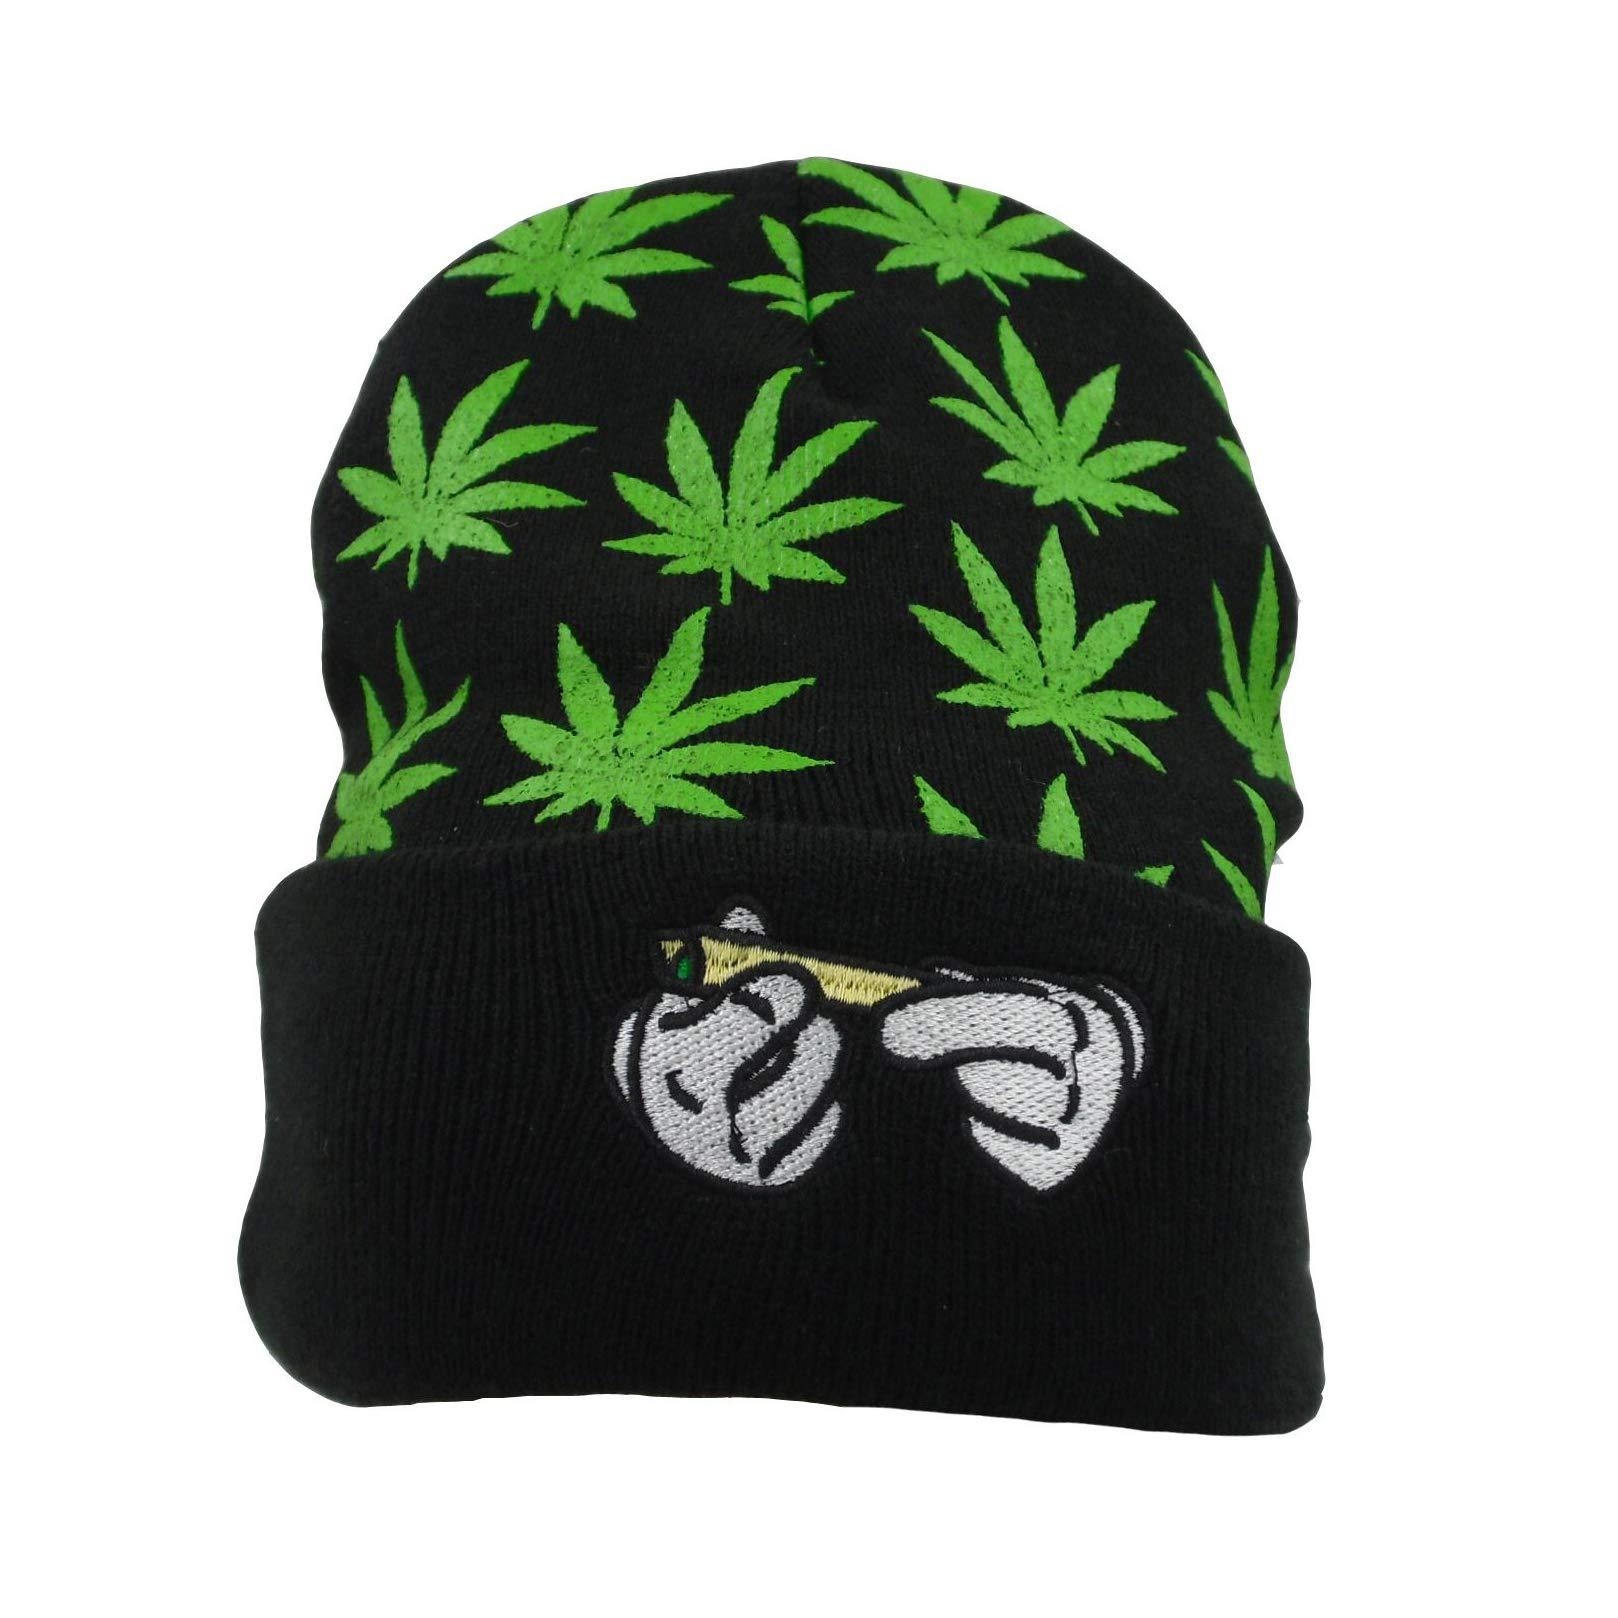 Weed Marijuana Acrylic Beanie Hat ,Leaf Pot Cuffed Knit Winter Weed Beanie Hat Mens Women